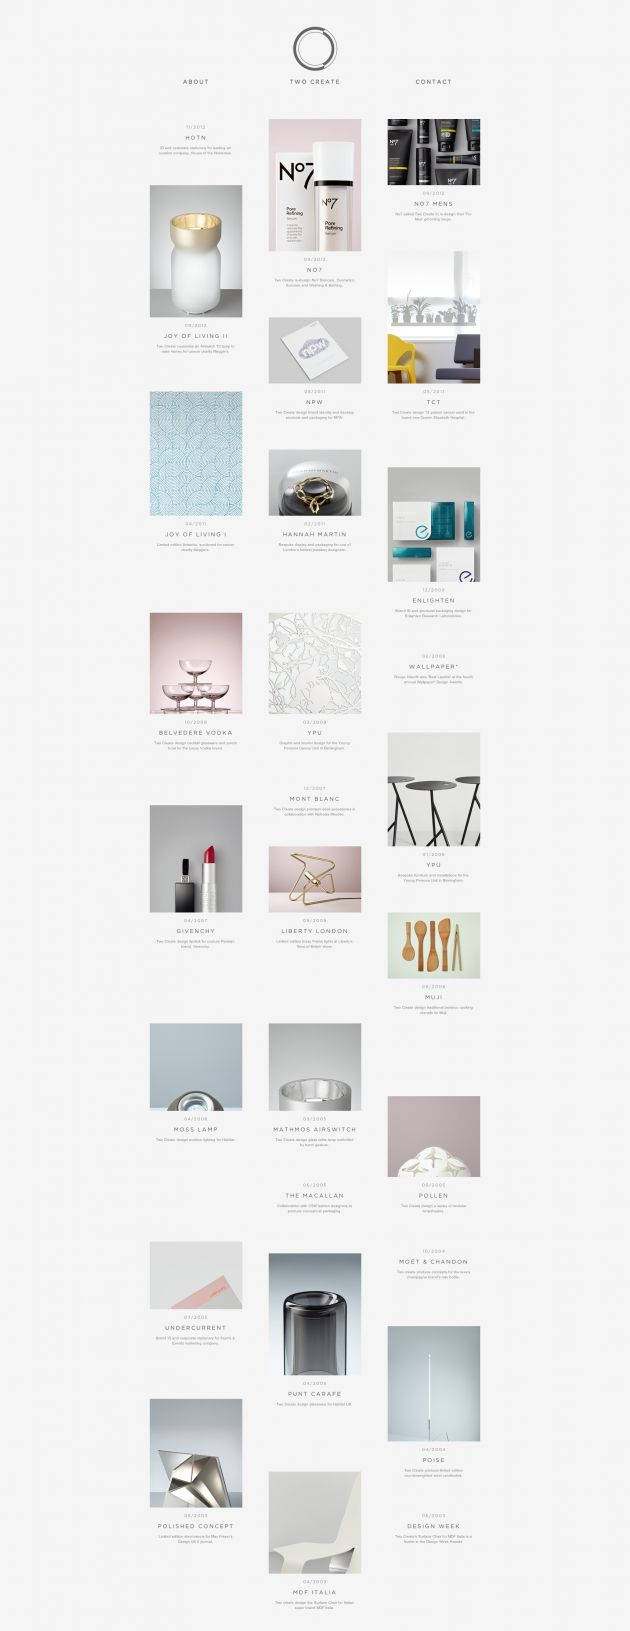 Styleboost: Two Create